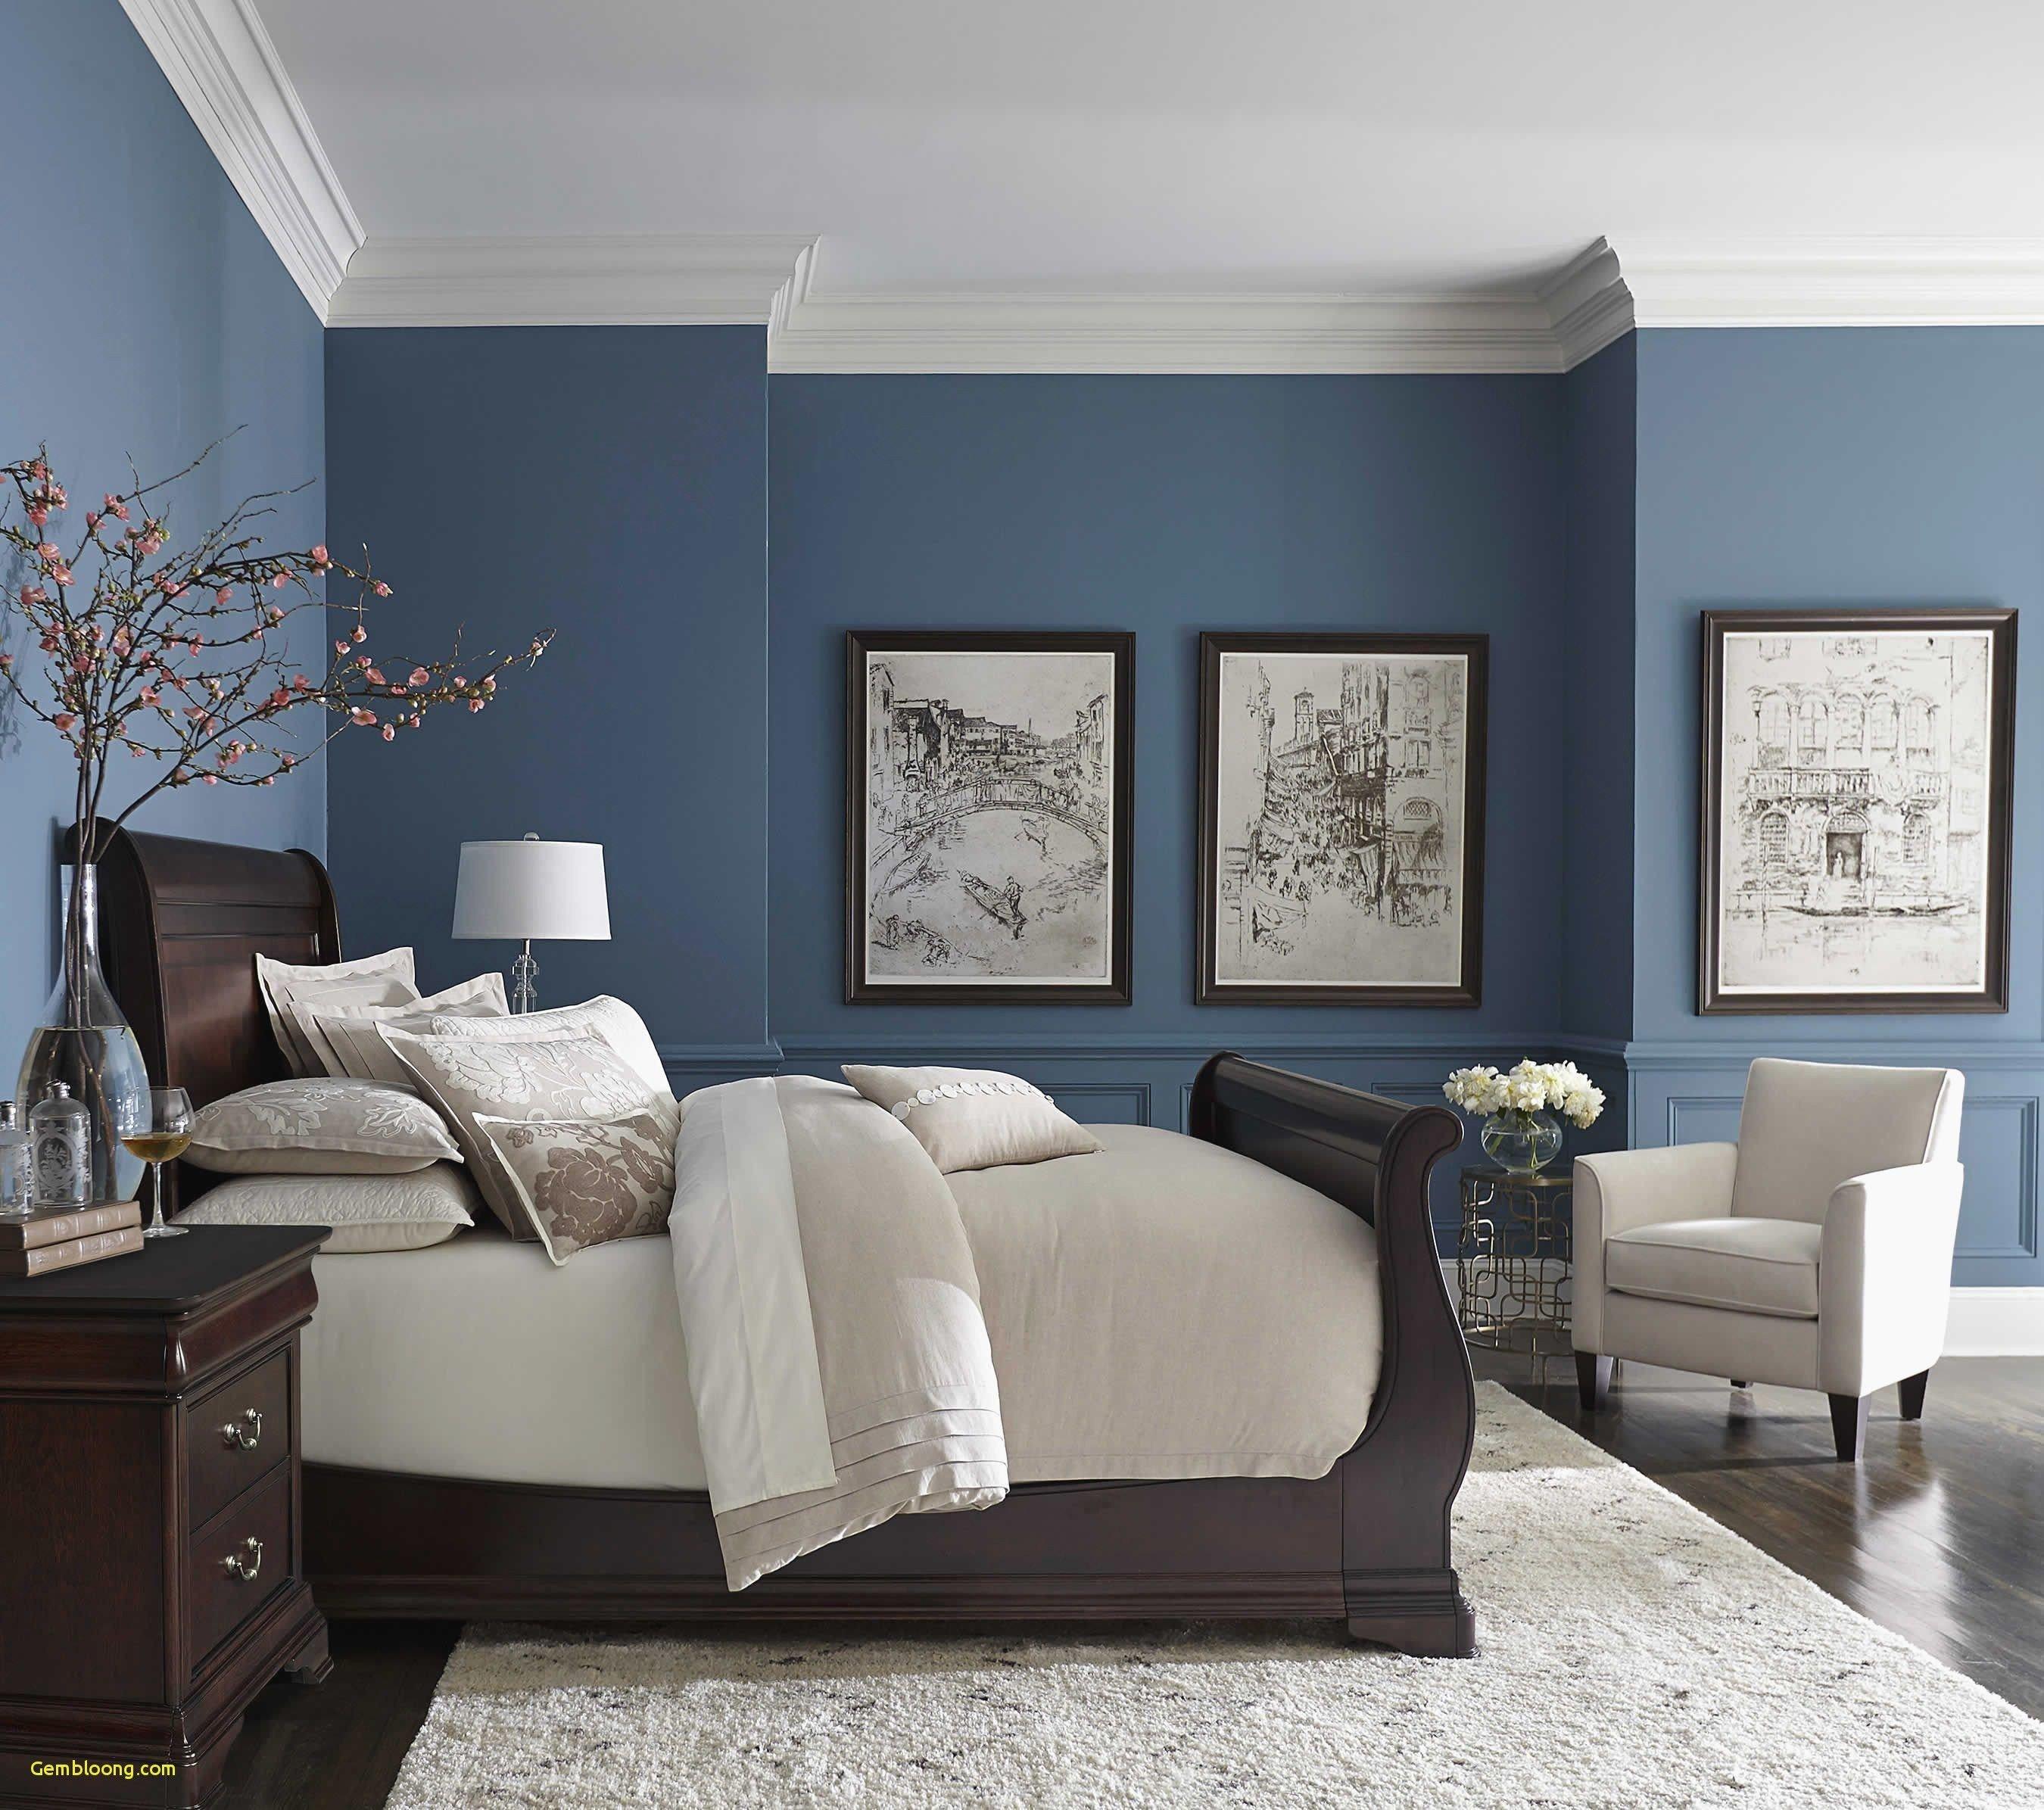 Purple and Teal Bedroom New Rooms Purple Mauve Paint Color Best Colors Games 0d